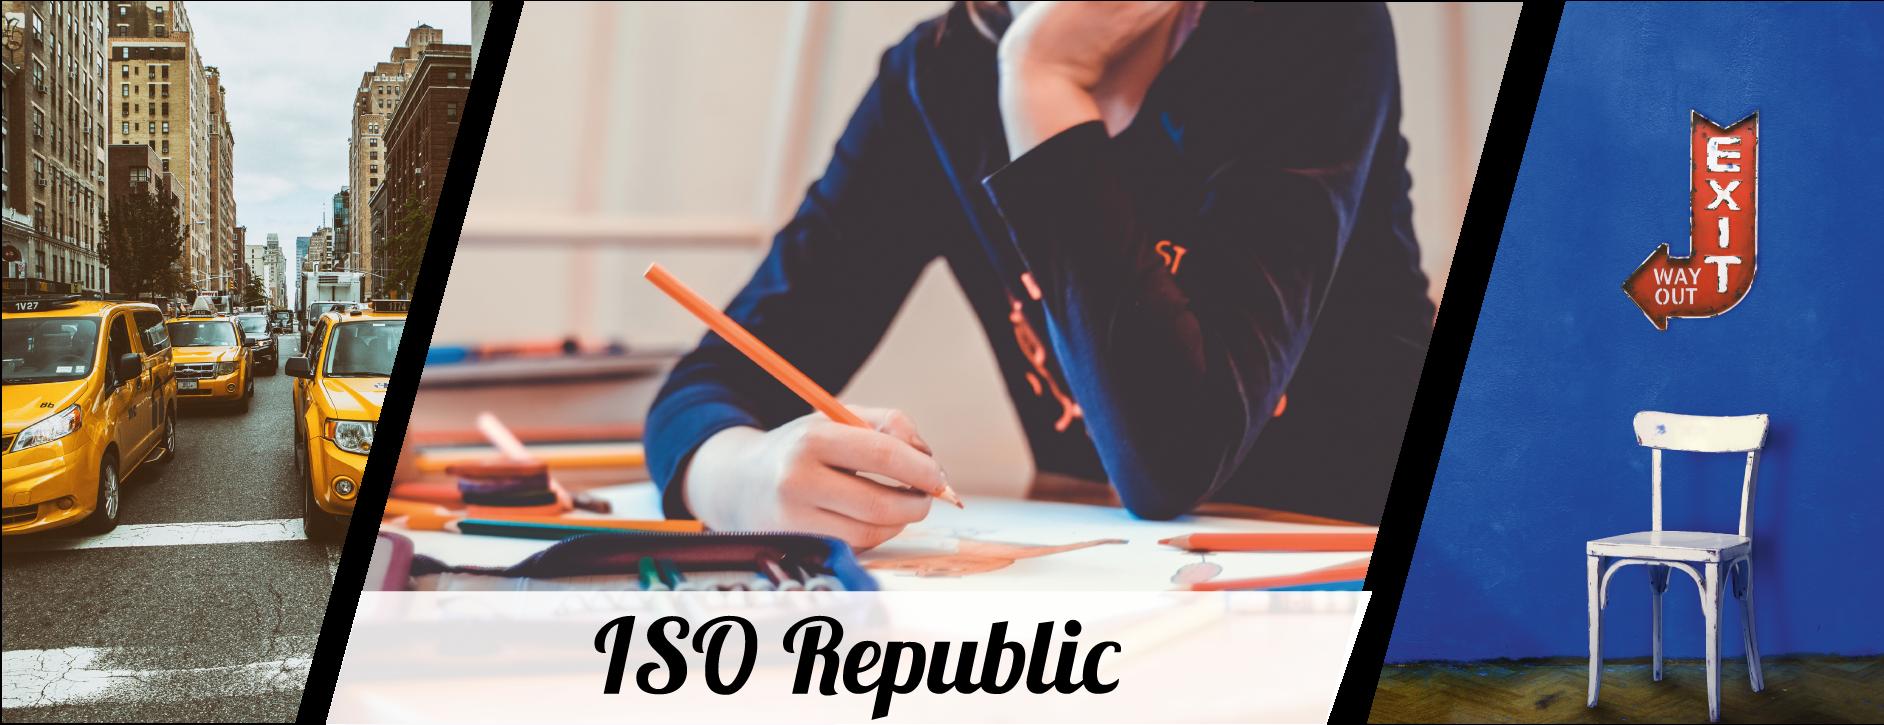 ISO Republic image collage